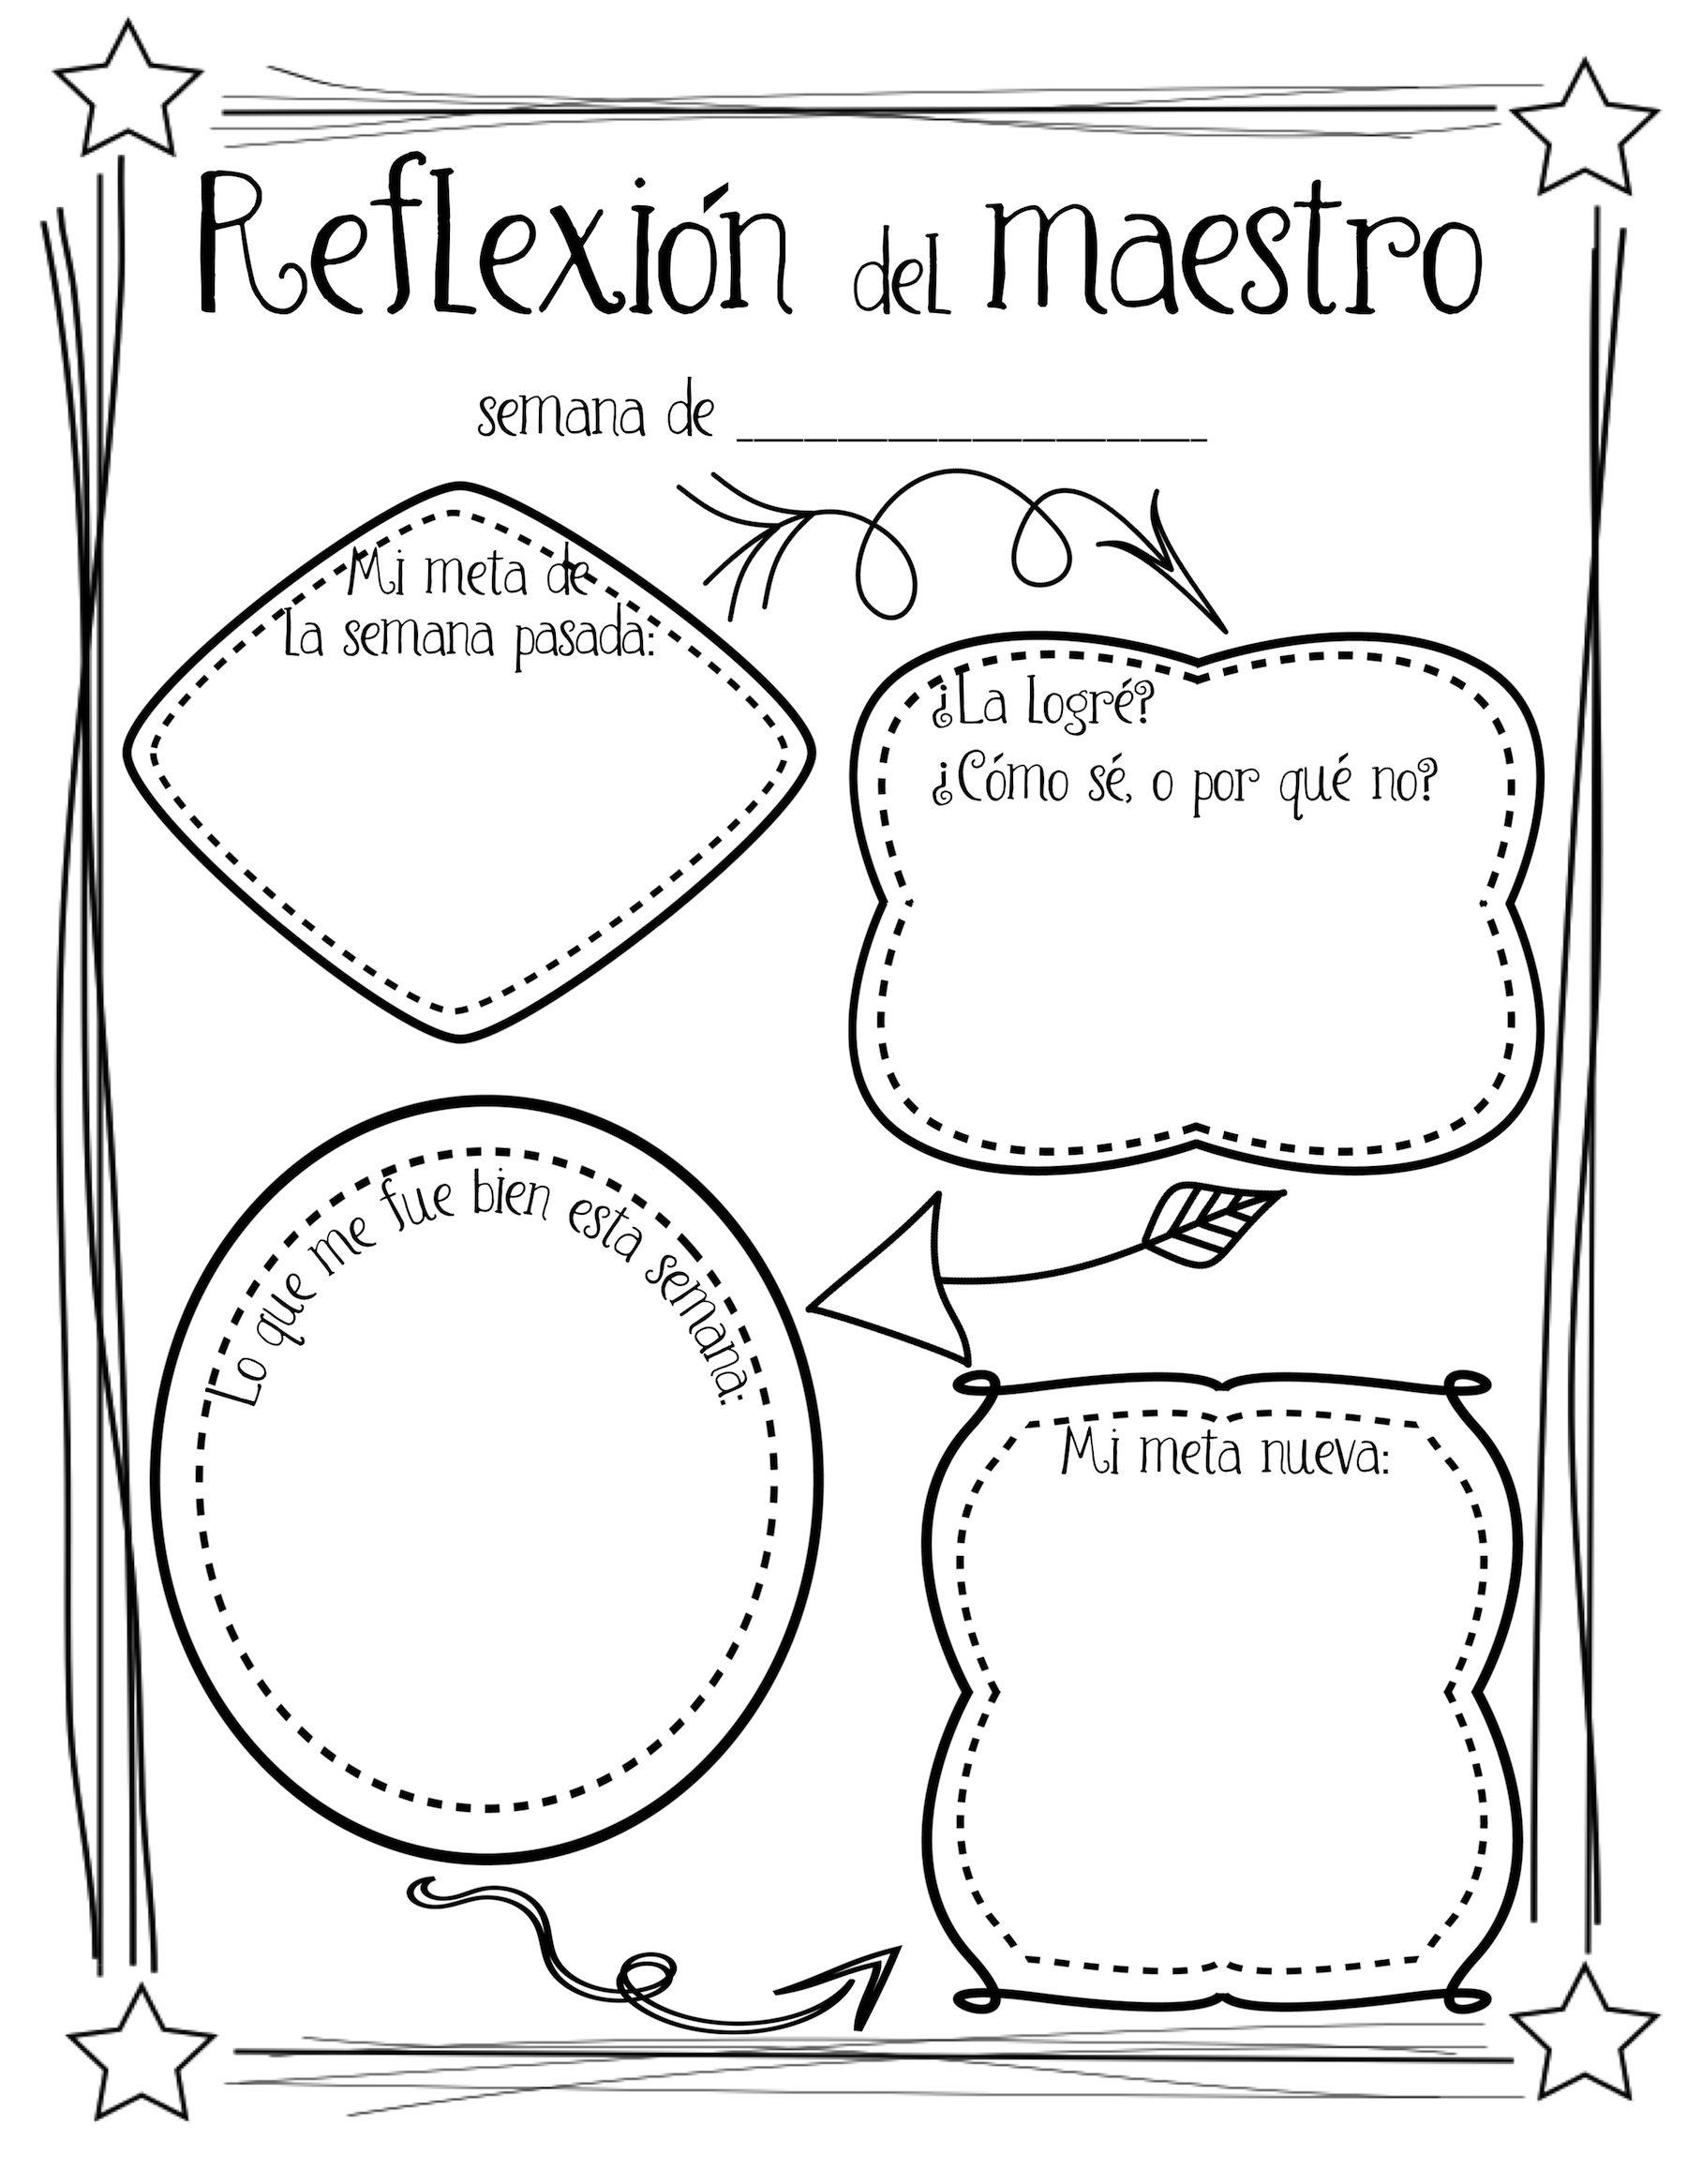 Bilingual Teacher Reflection Amp Goals